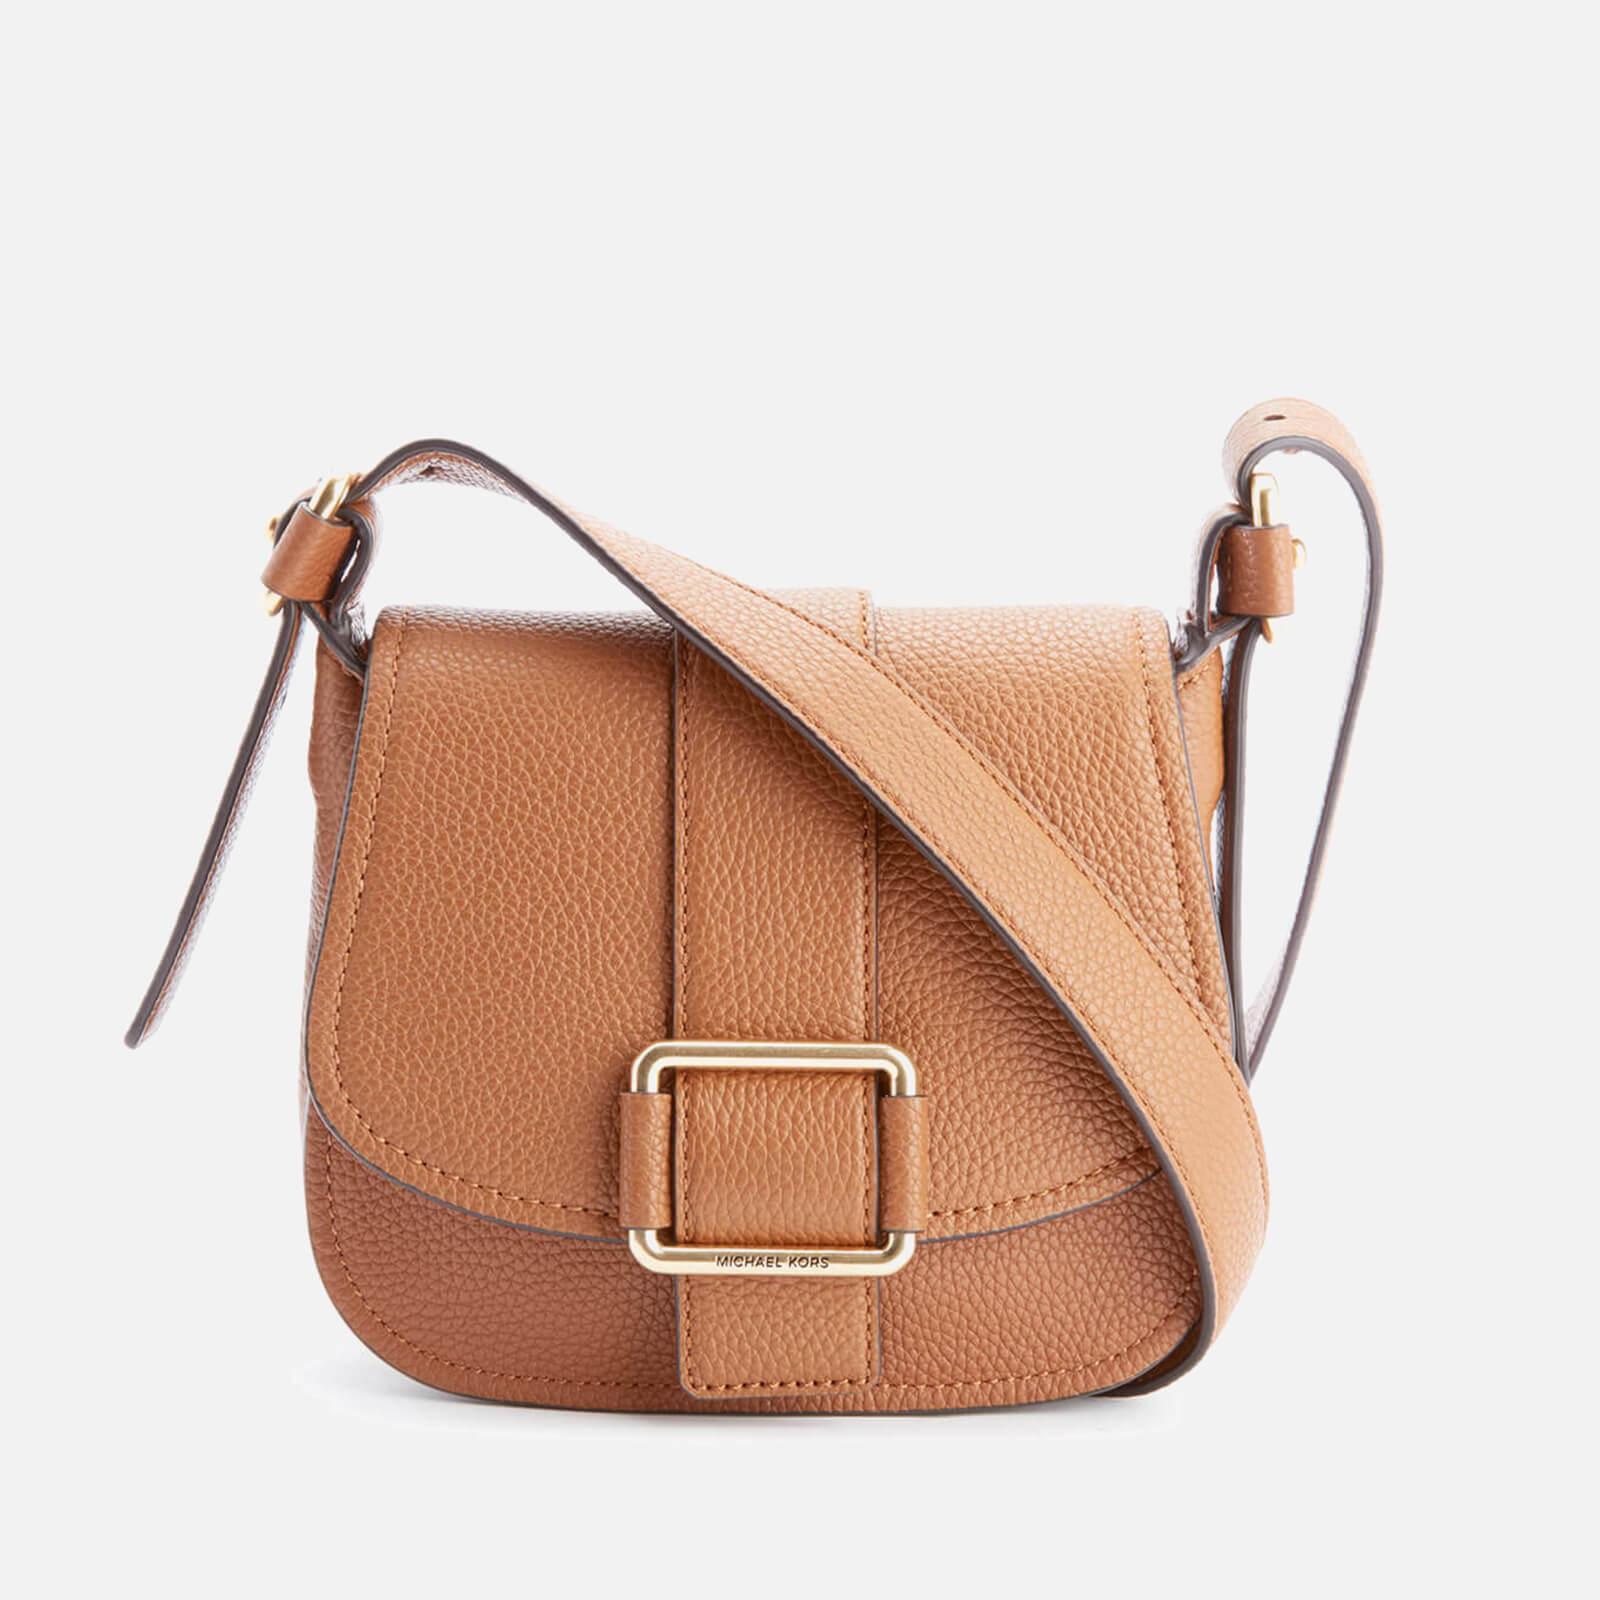 c4b51dbad1f8e MICHAEL MICHAEL KORS Women s Maxine Mid Saddle Bag - Luggage - Free UK  Delivery over £50